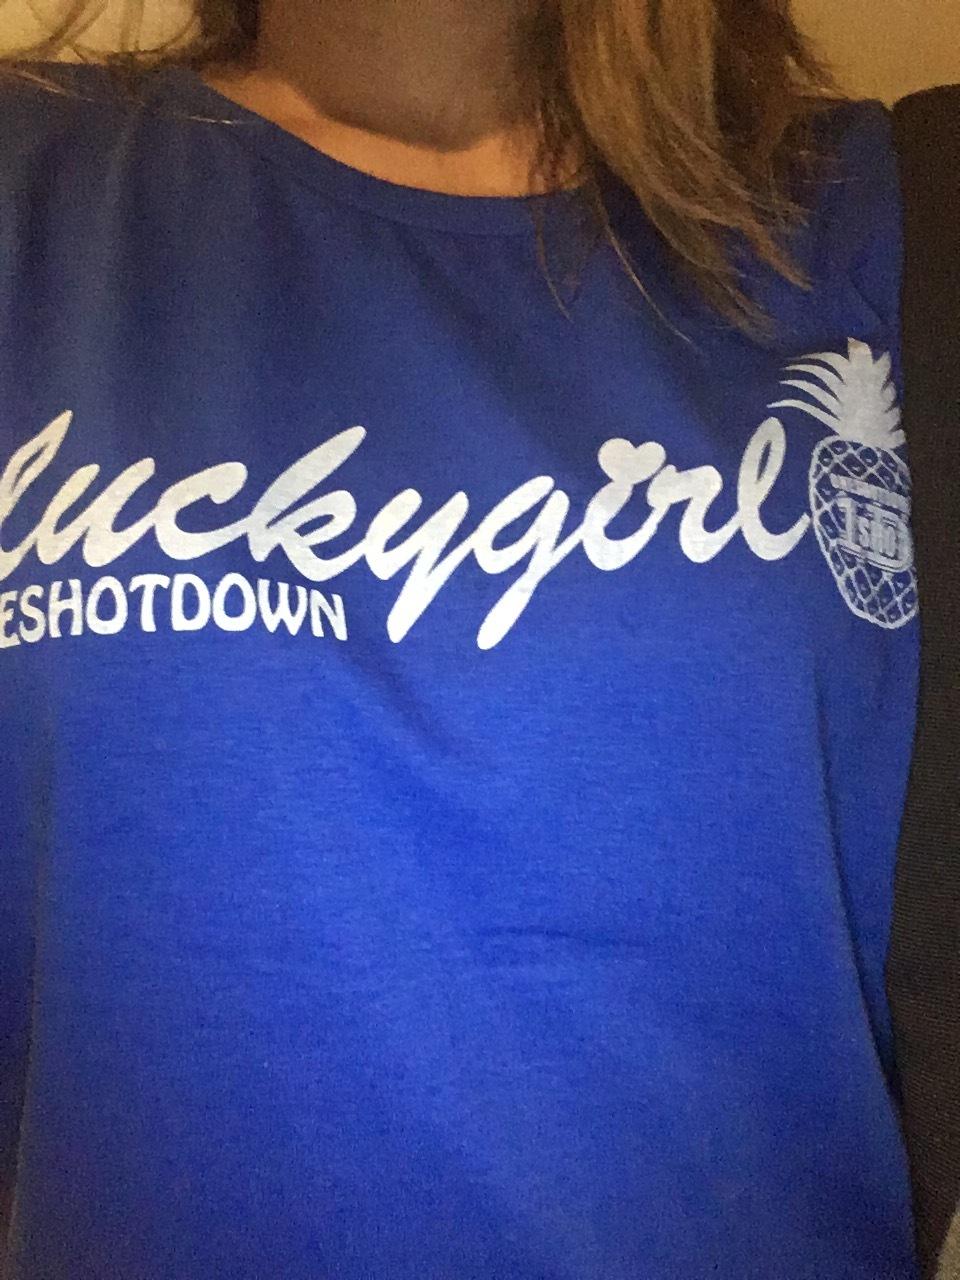 "ONESHOTDOWN ガールズ  ""ラッキーガール"" Tシャツ - 画像5"